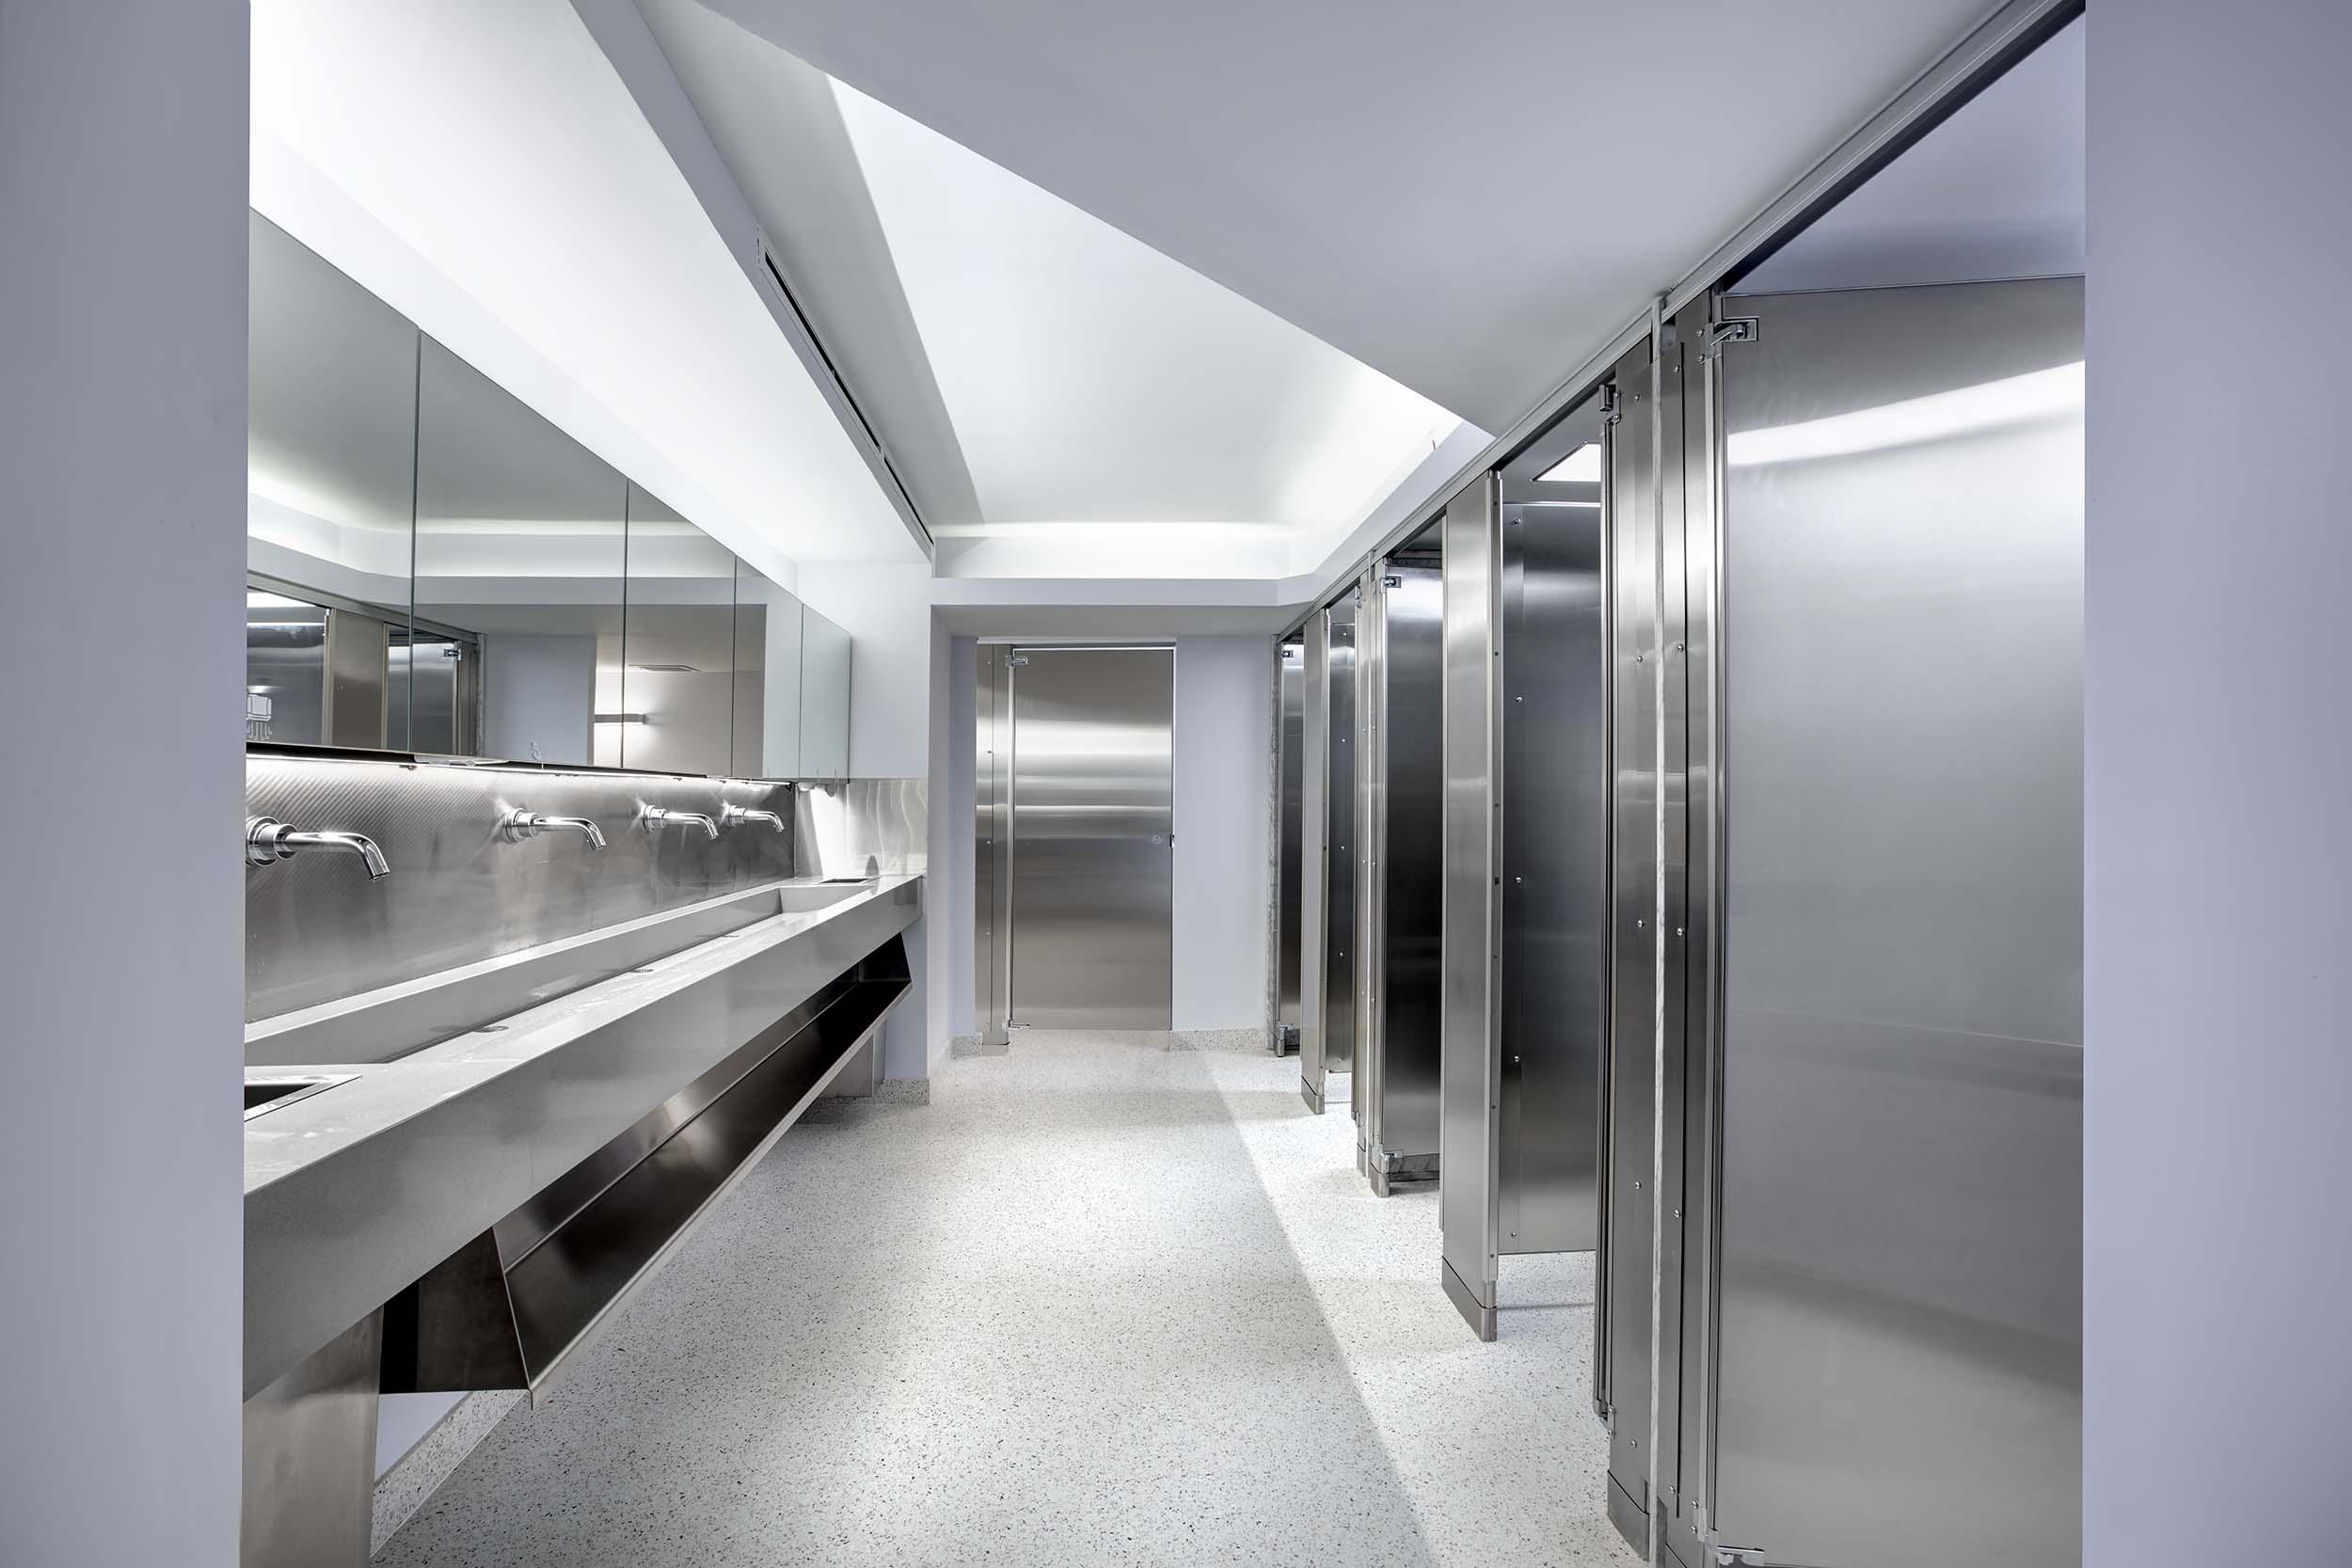 Solstice_Architects_Van_Wezel_03.jpg